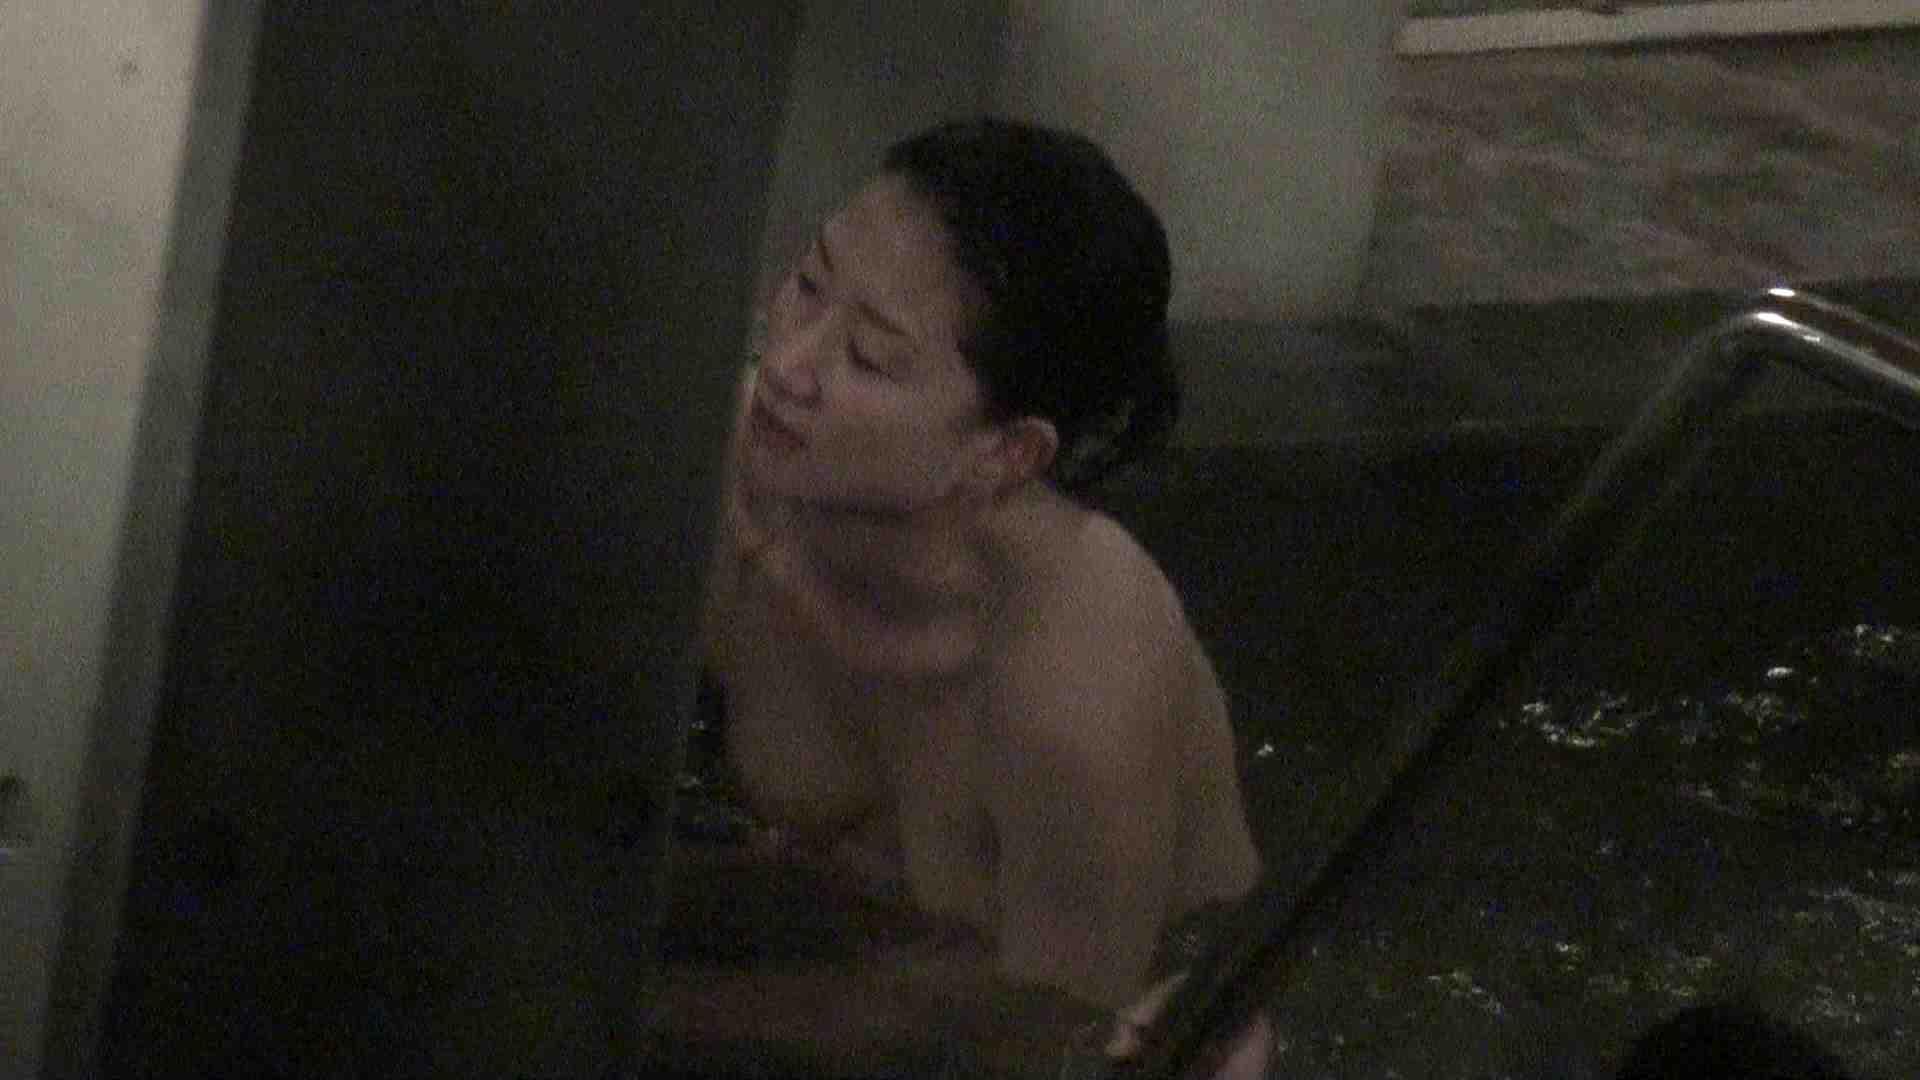 Aquaな露天風呂Vol.366 盗撮   HなOL  84pic 69